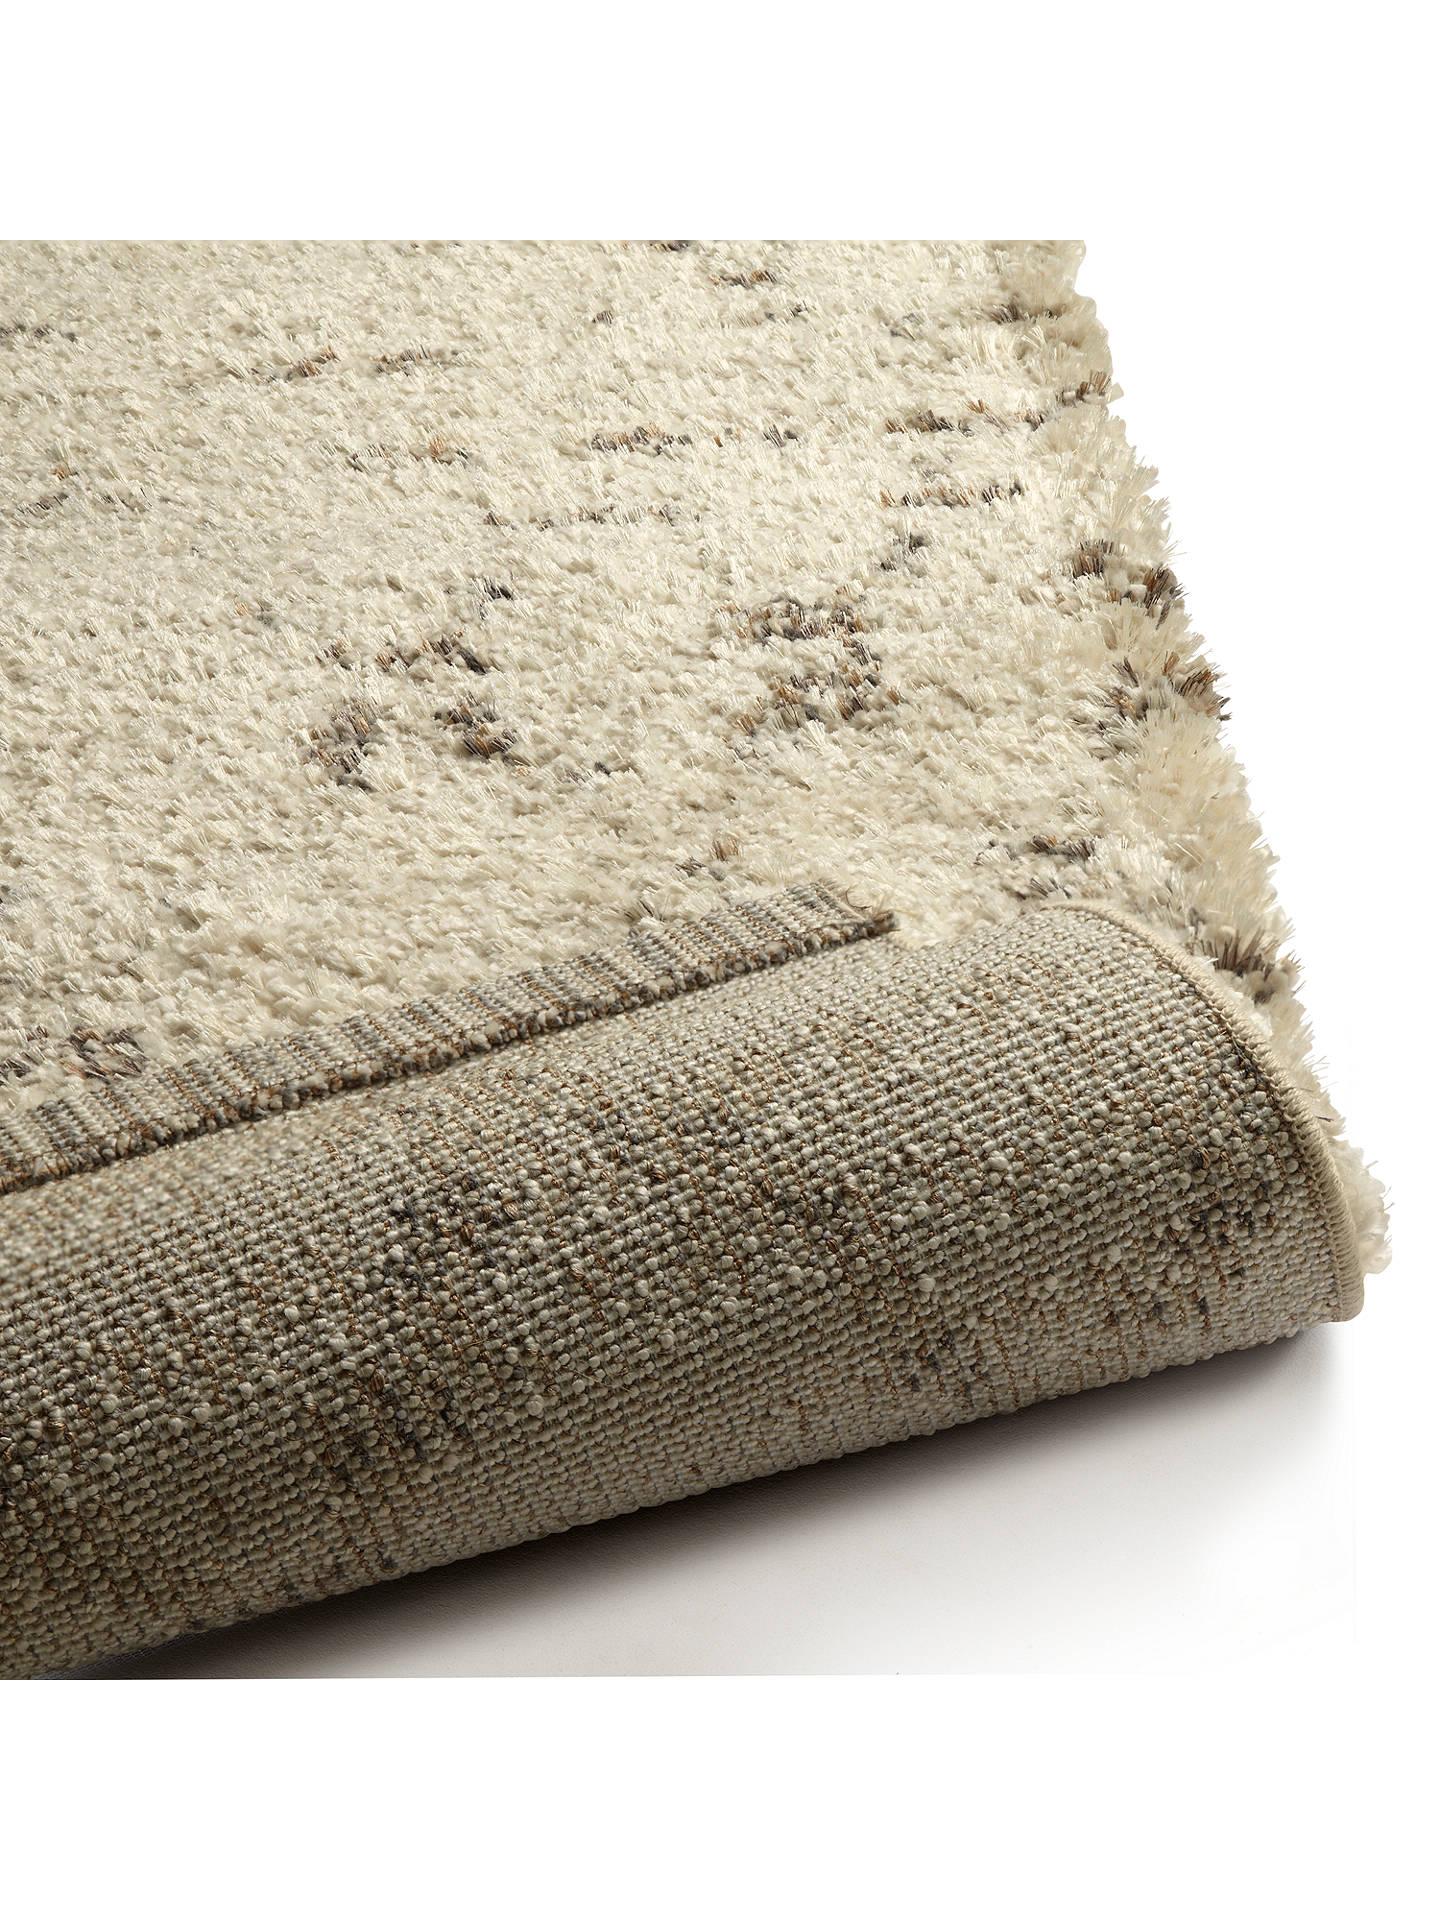 John Lewis Partners Luxe Berber Rug